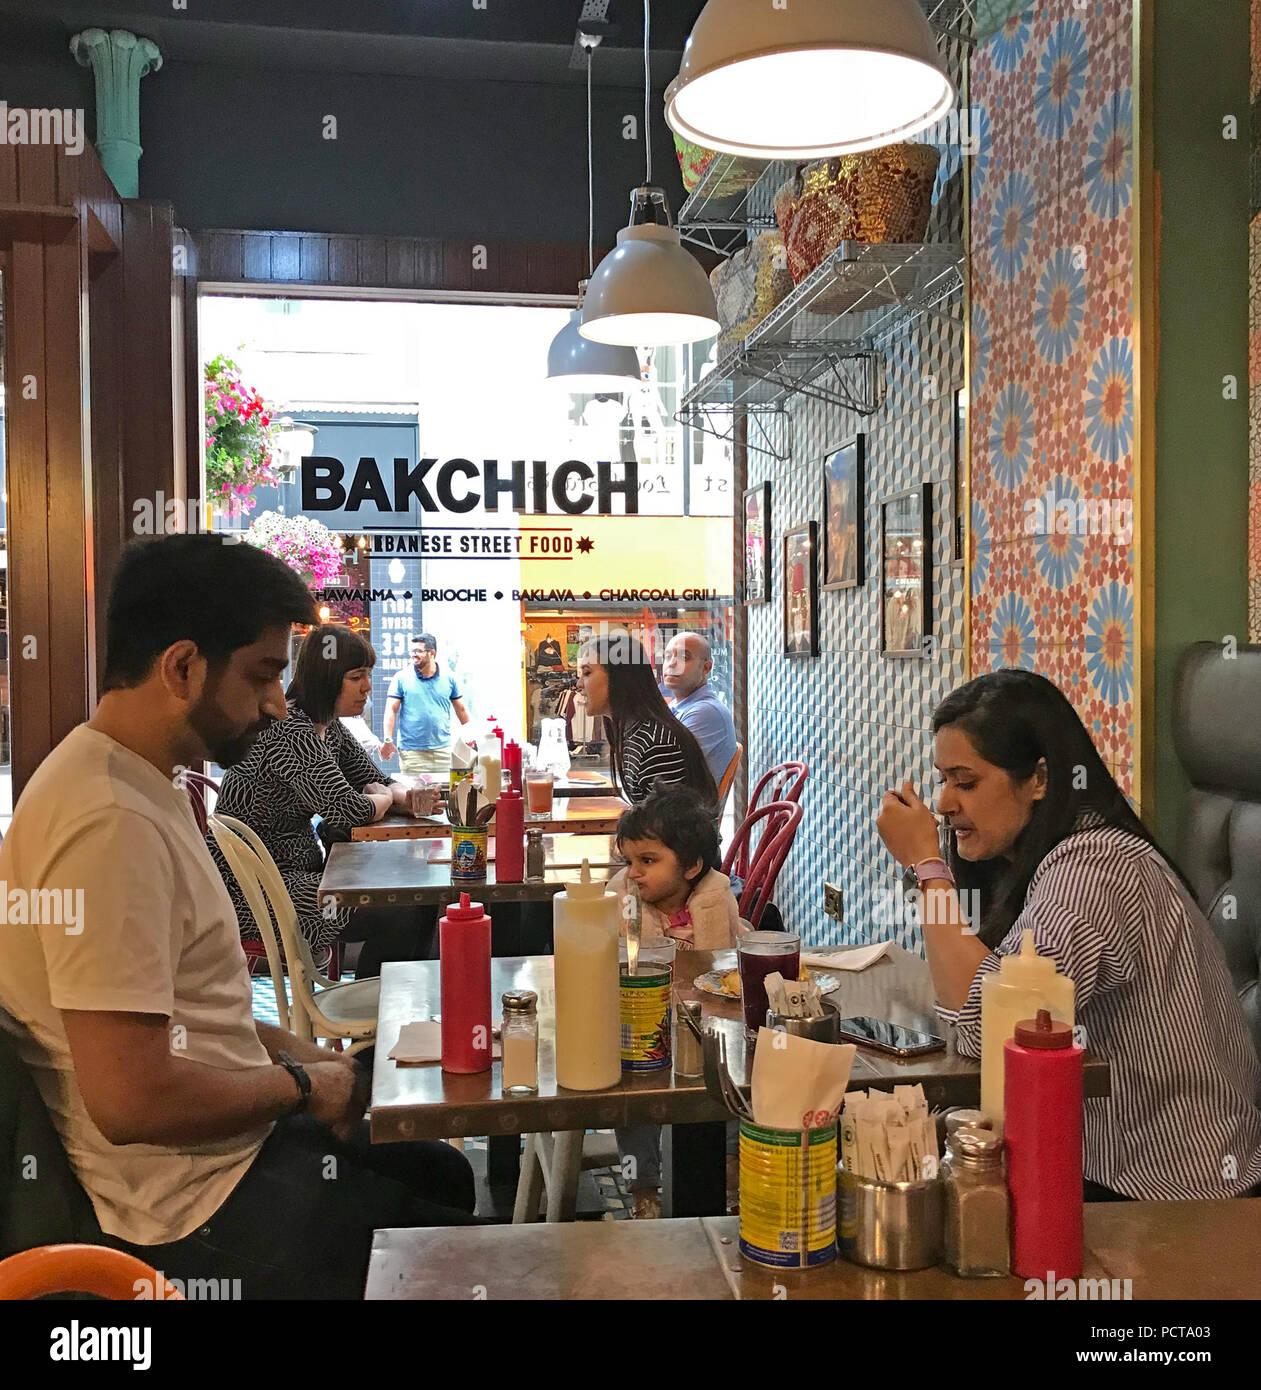 GoTonySmith,@HotpixUK,street food,food,inside,interior,Merseyside,City Centre,diners,dining,eating,table,tables,window,windows,design,french,Bold St,54 Bold St,UK,L1 4ER,Lebanese,Lebanon,Restaurant,Bold Street,family,cold mezze,hot mezze,mezze,dip,grill,halal,fresh ingredients,fresh,ingredients,Arabic food culture,Arabic food,culture,Loose Change